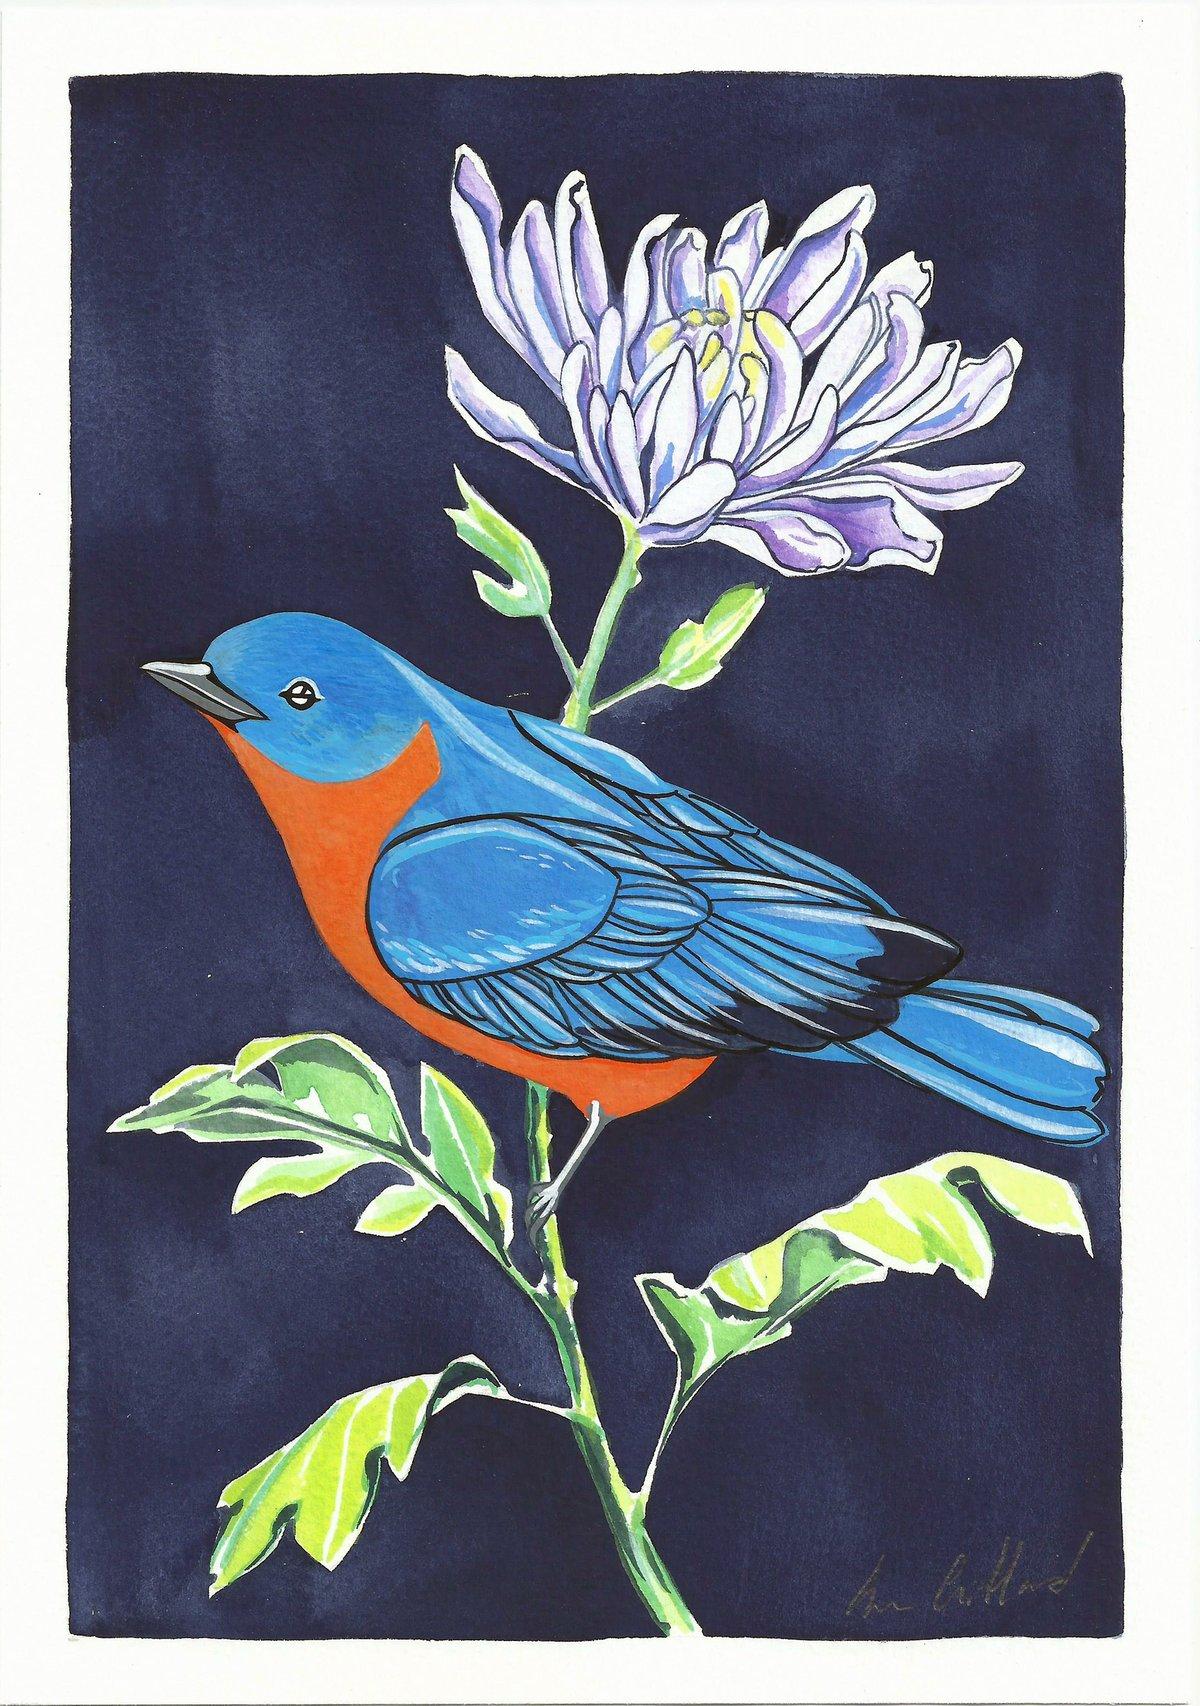 Image of Bluebird and Chrysanthemum